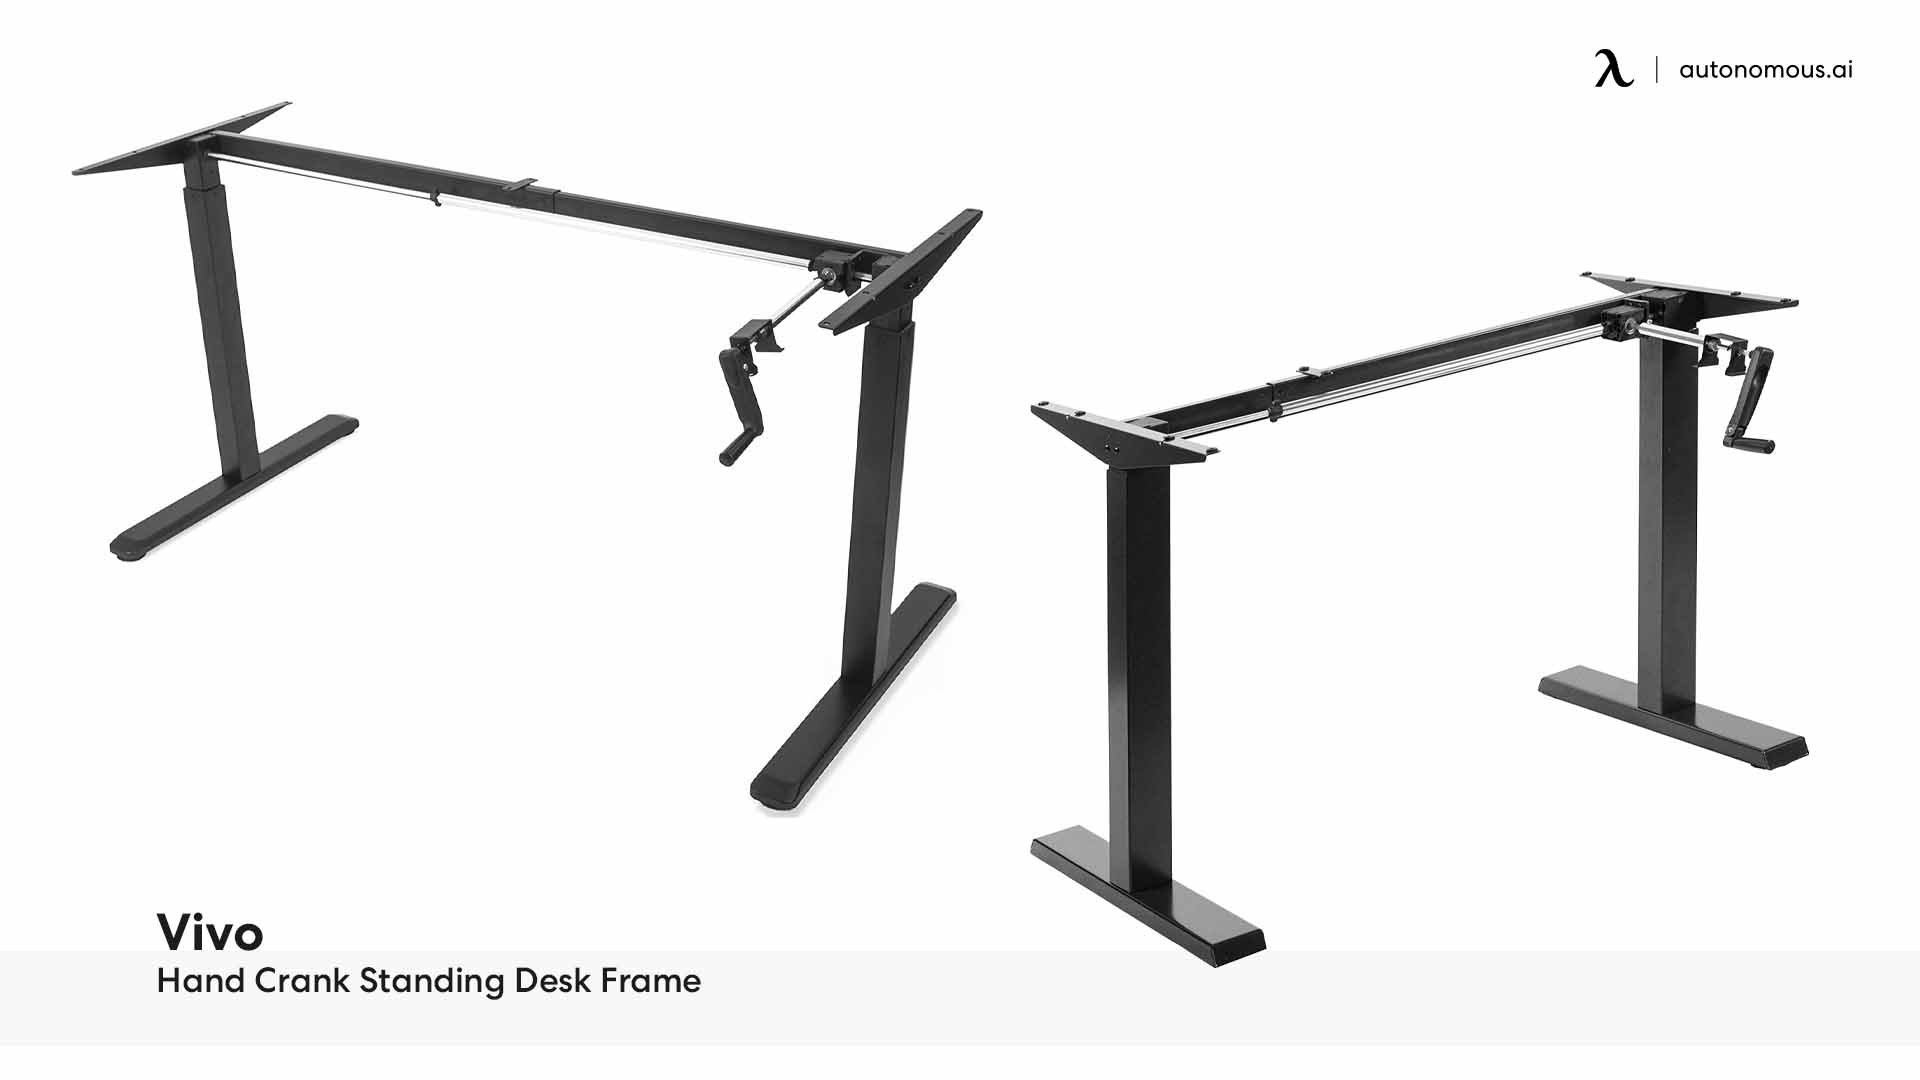 Vivo Hand Crank Standing Desk Frame